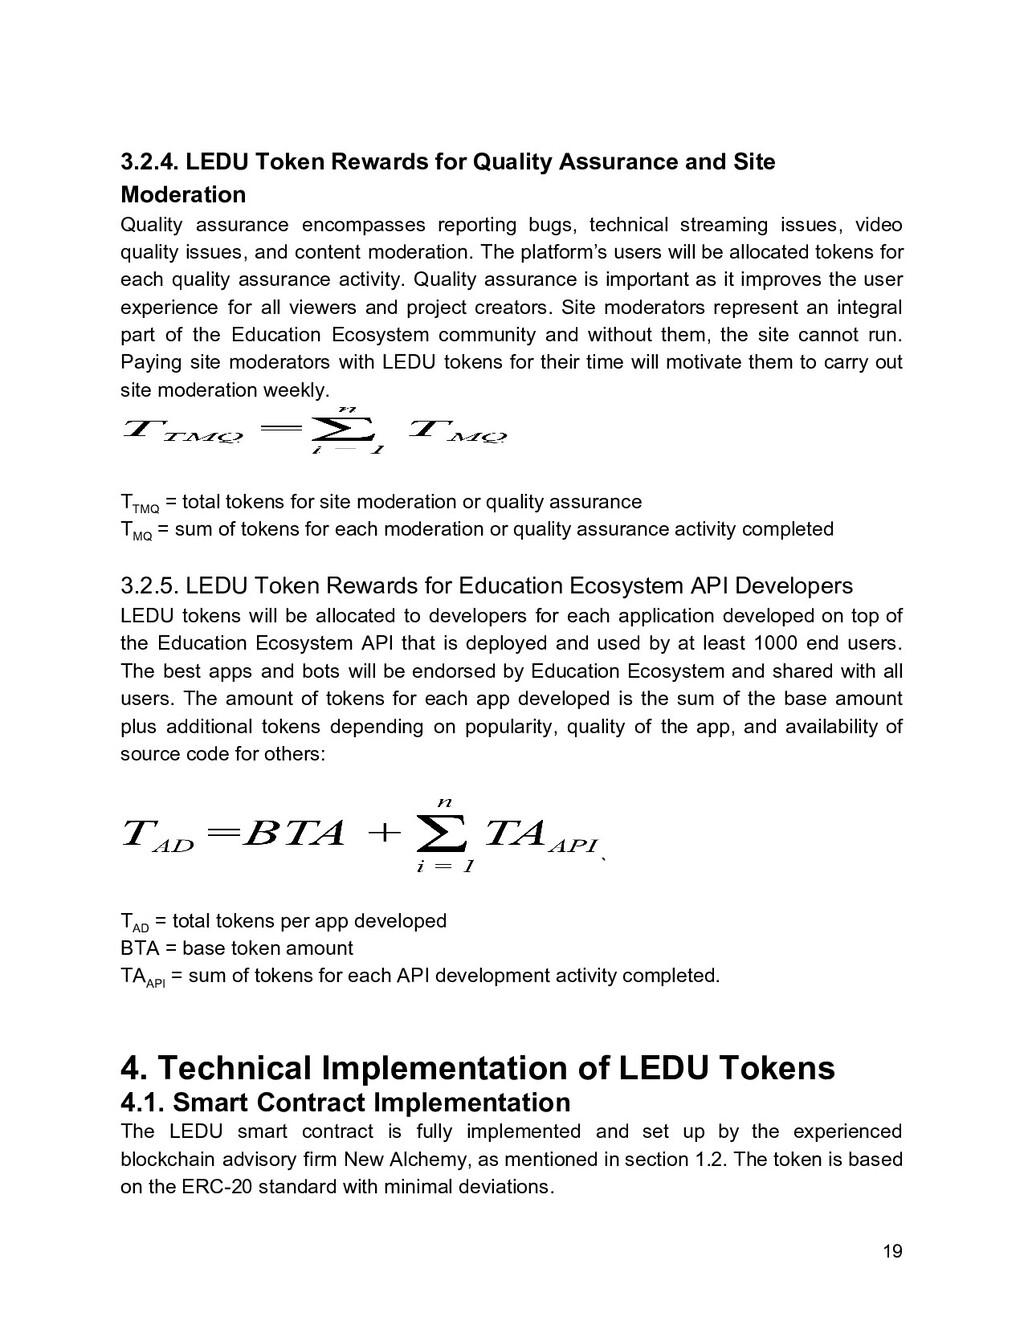 3.2.4. LEDU Token Rewards for Quality Assurance...